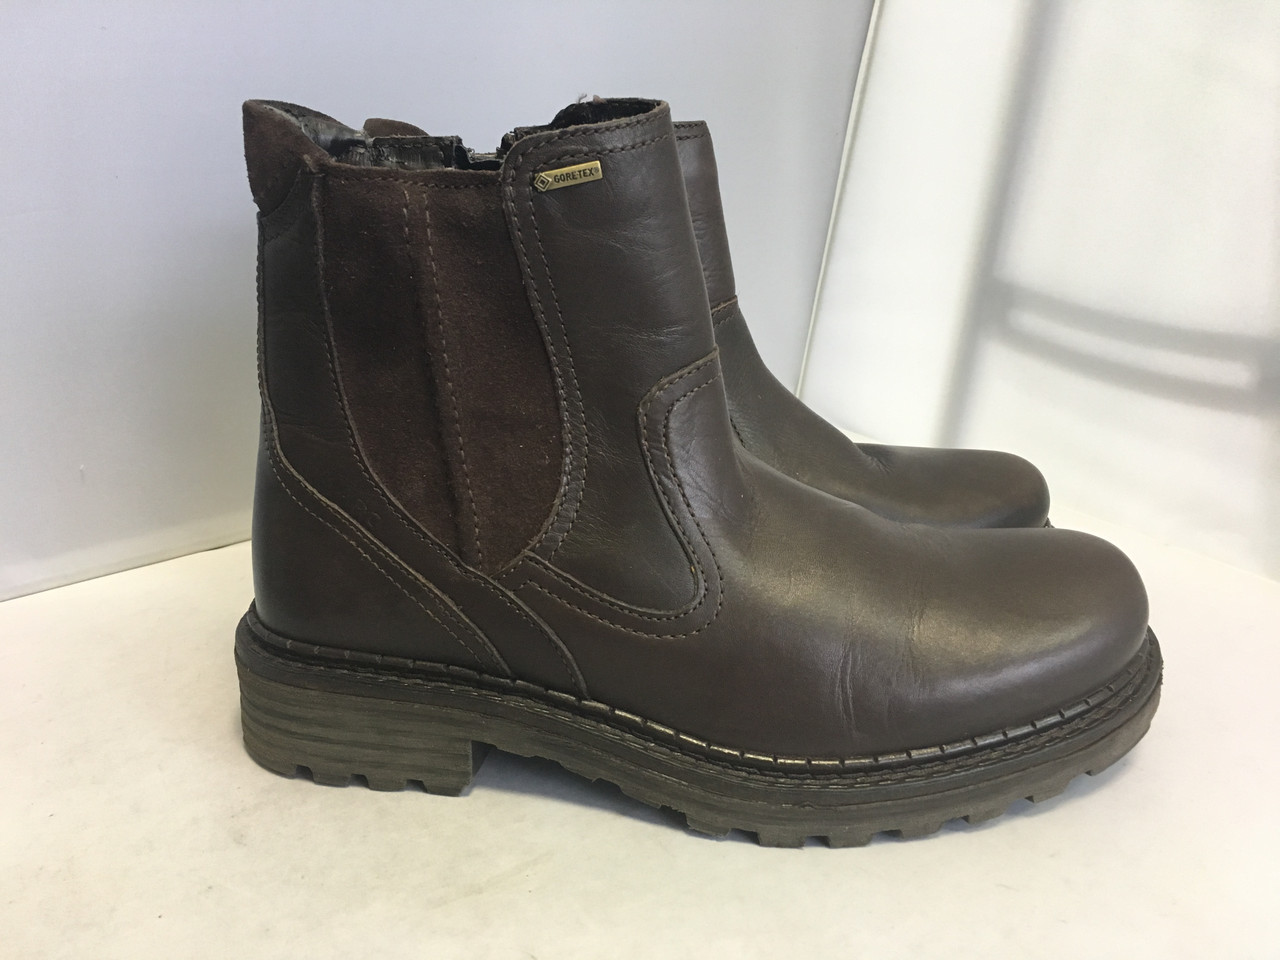 Мужские зимние ботинки Mark, 41р